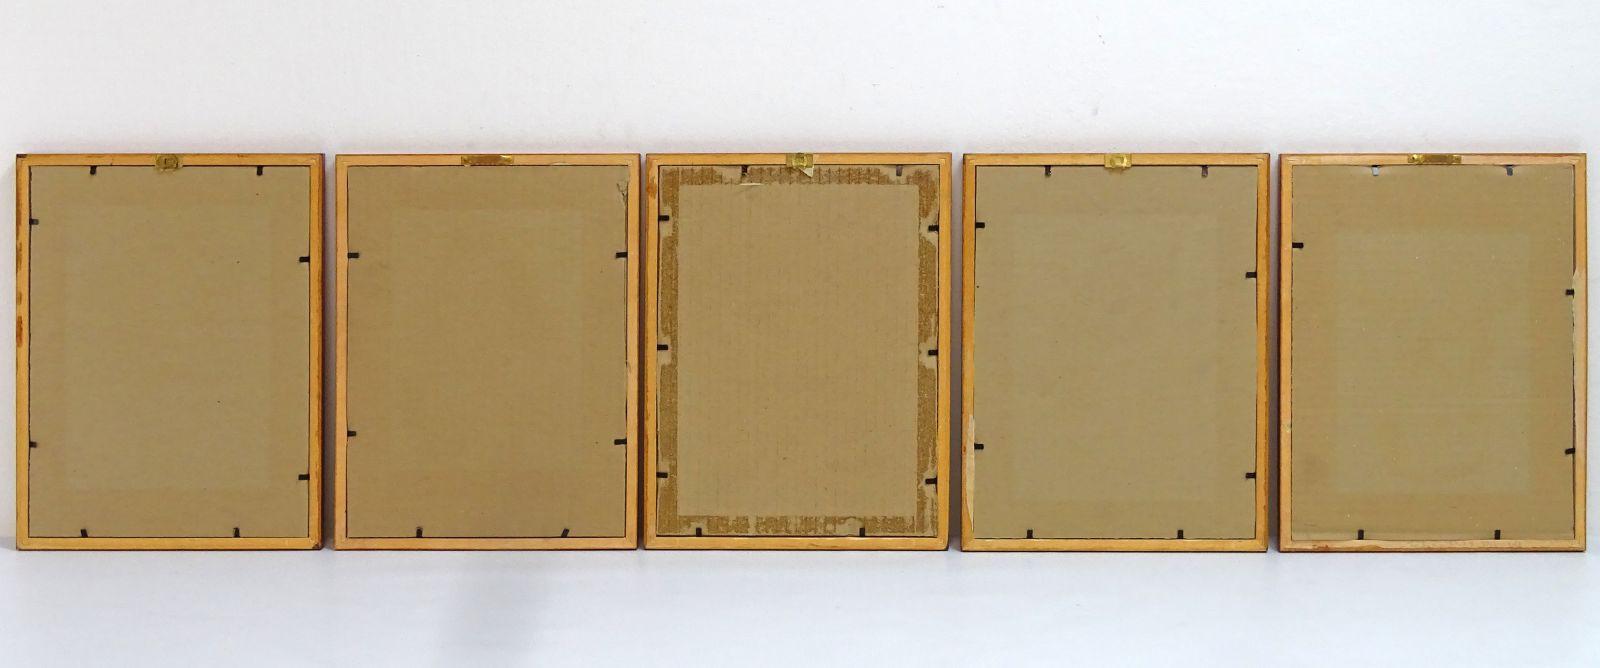 DSC05964.JPG (1600×668)